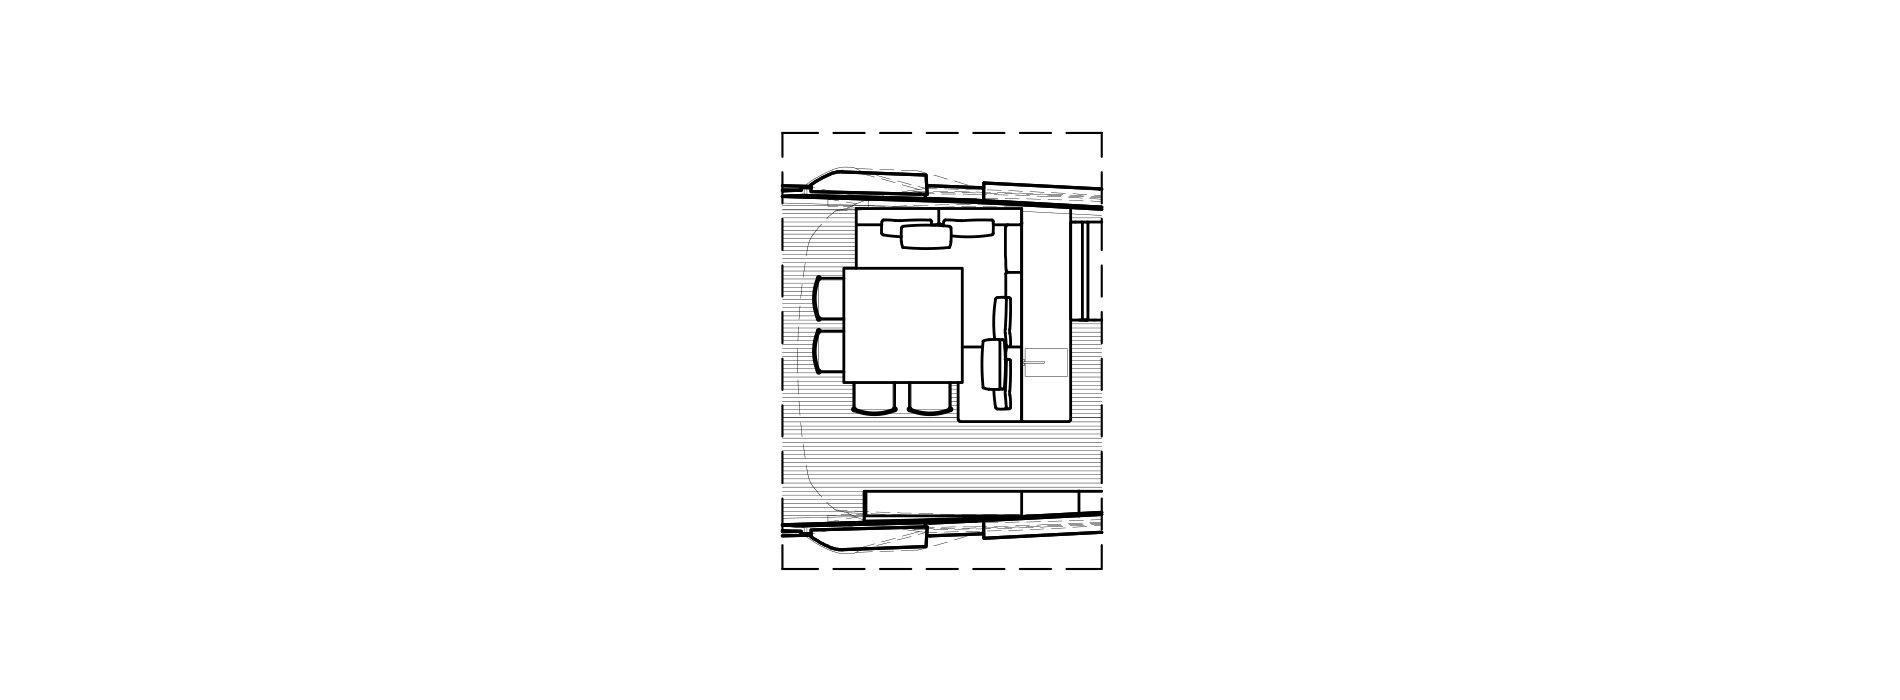 Sanlorenzo Yachts SX76 Dettagli Versione Lissoni